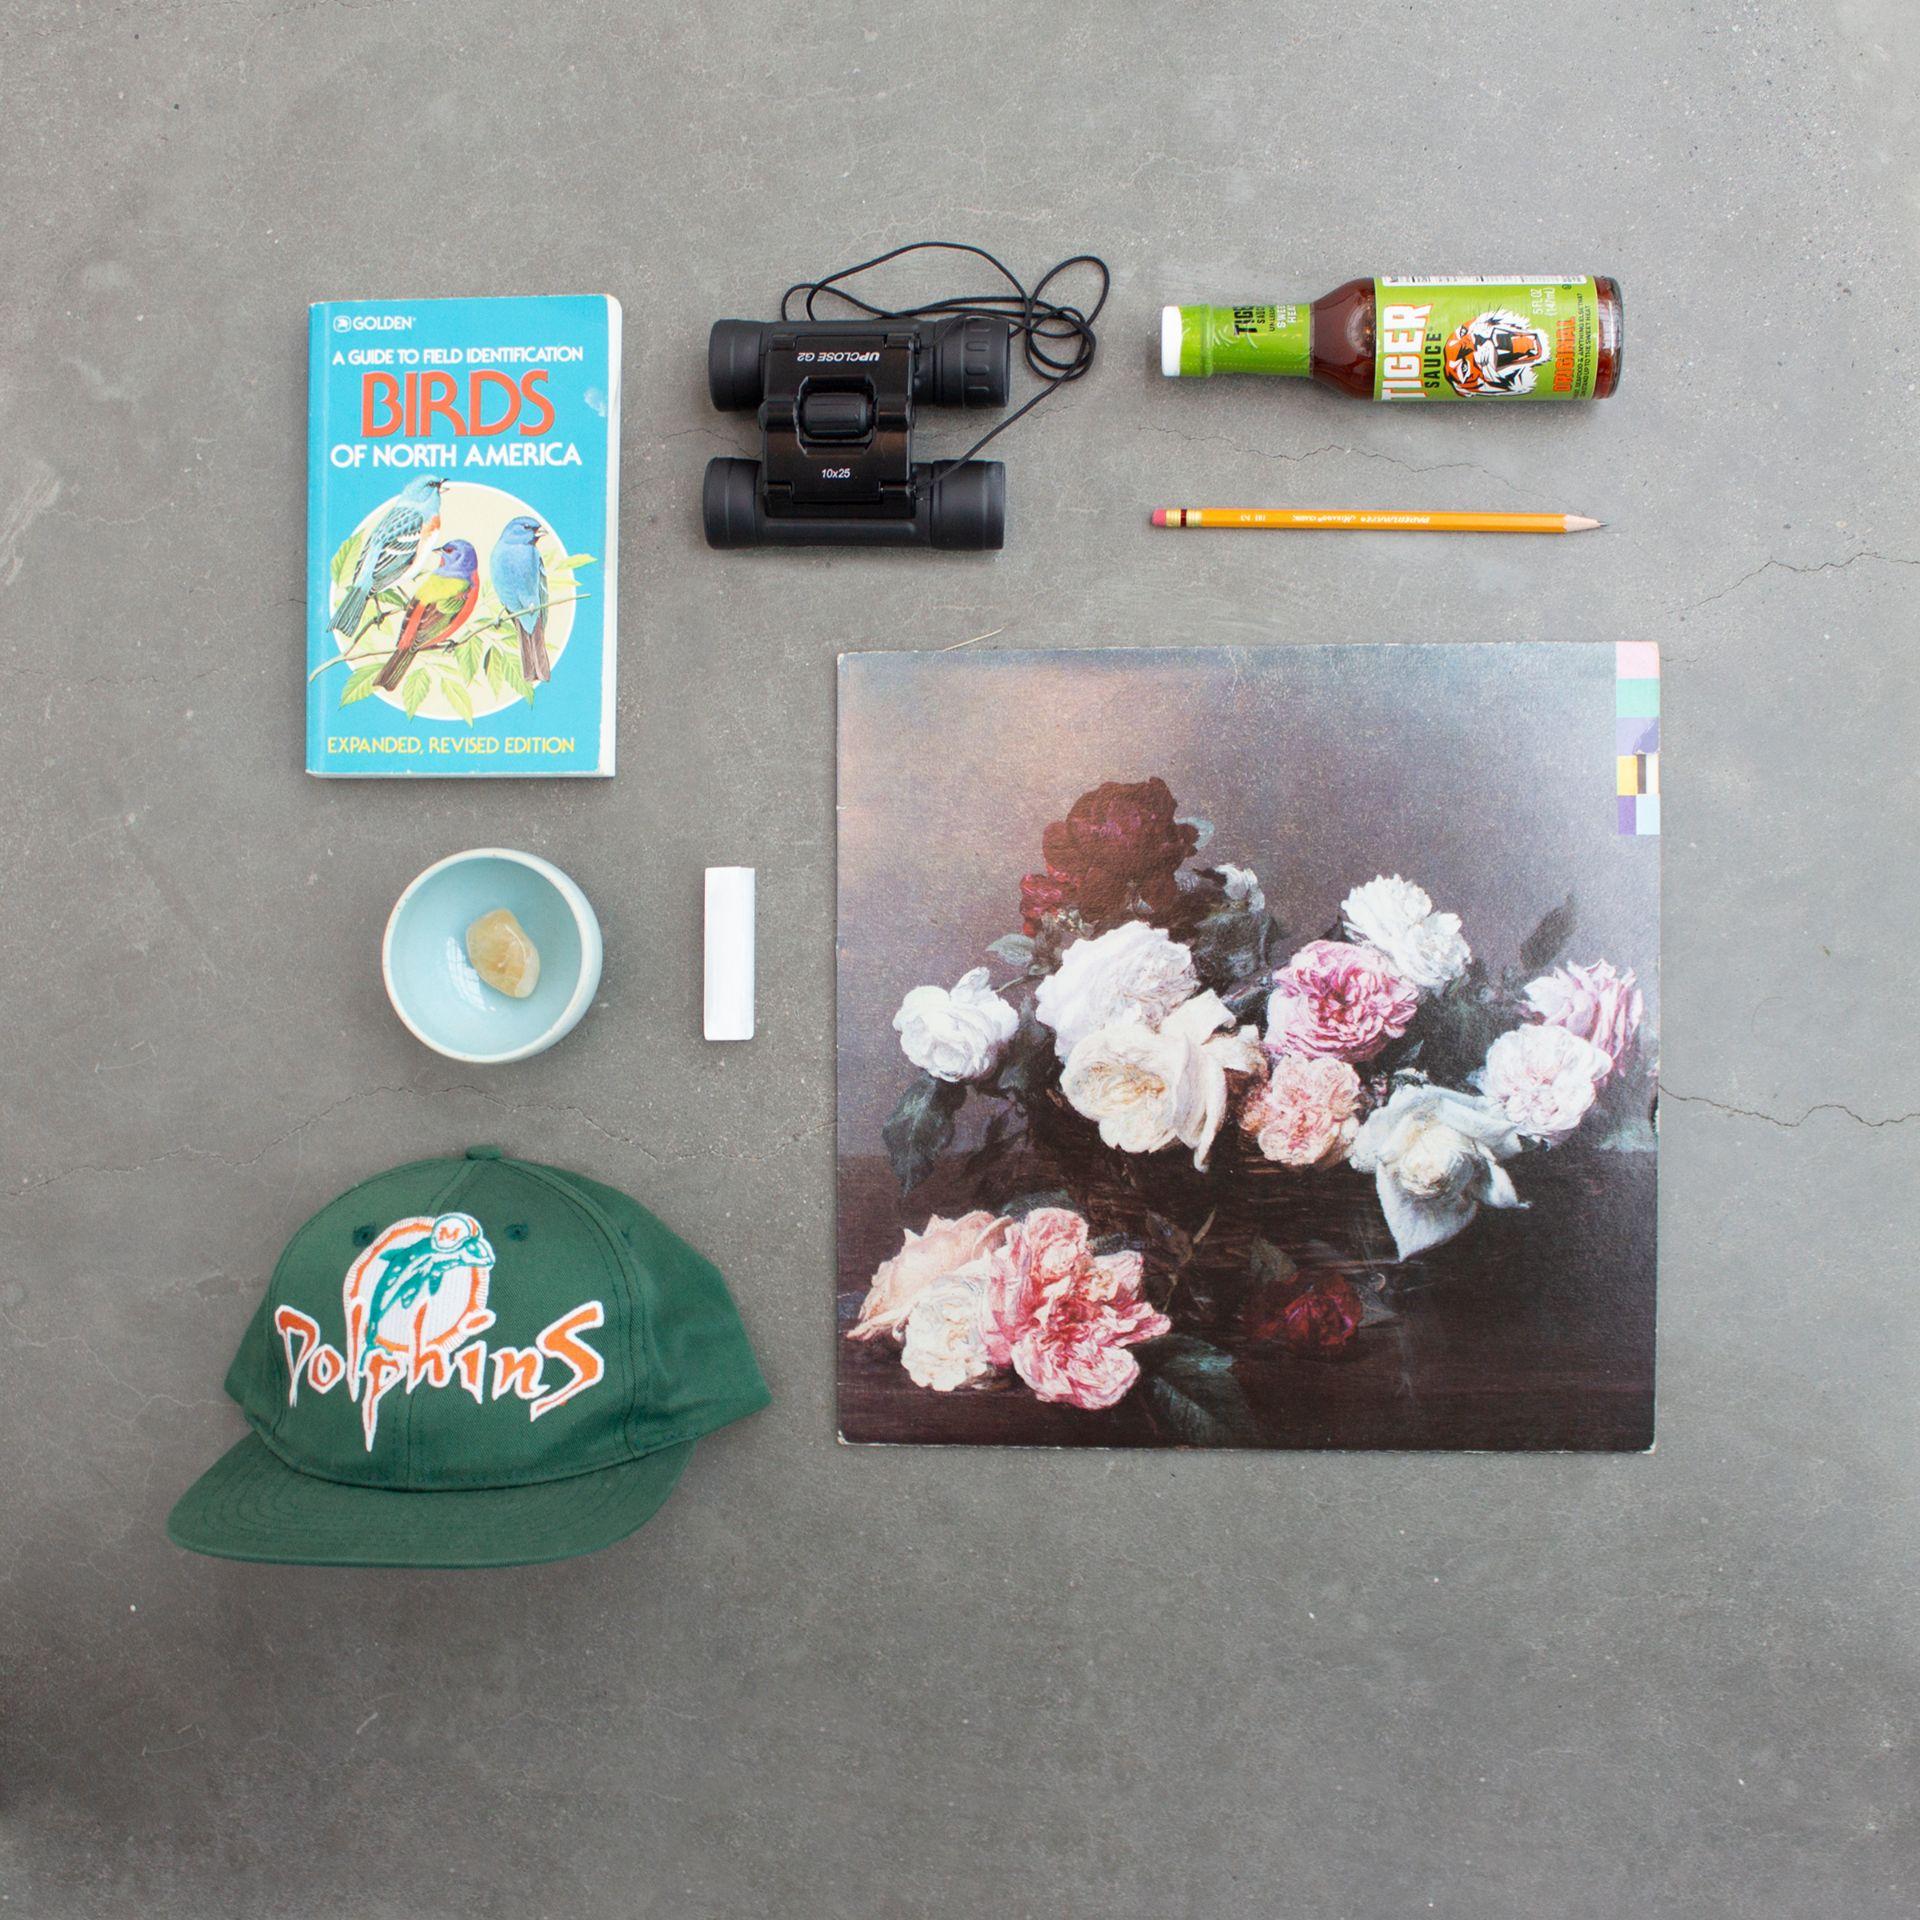 Ryan McGrew's flat lay of items representing his personality.